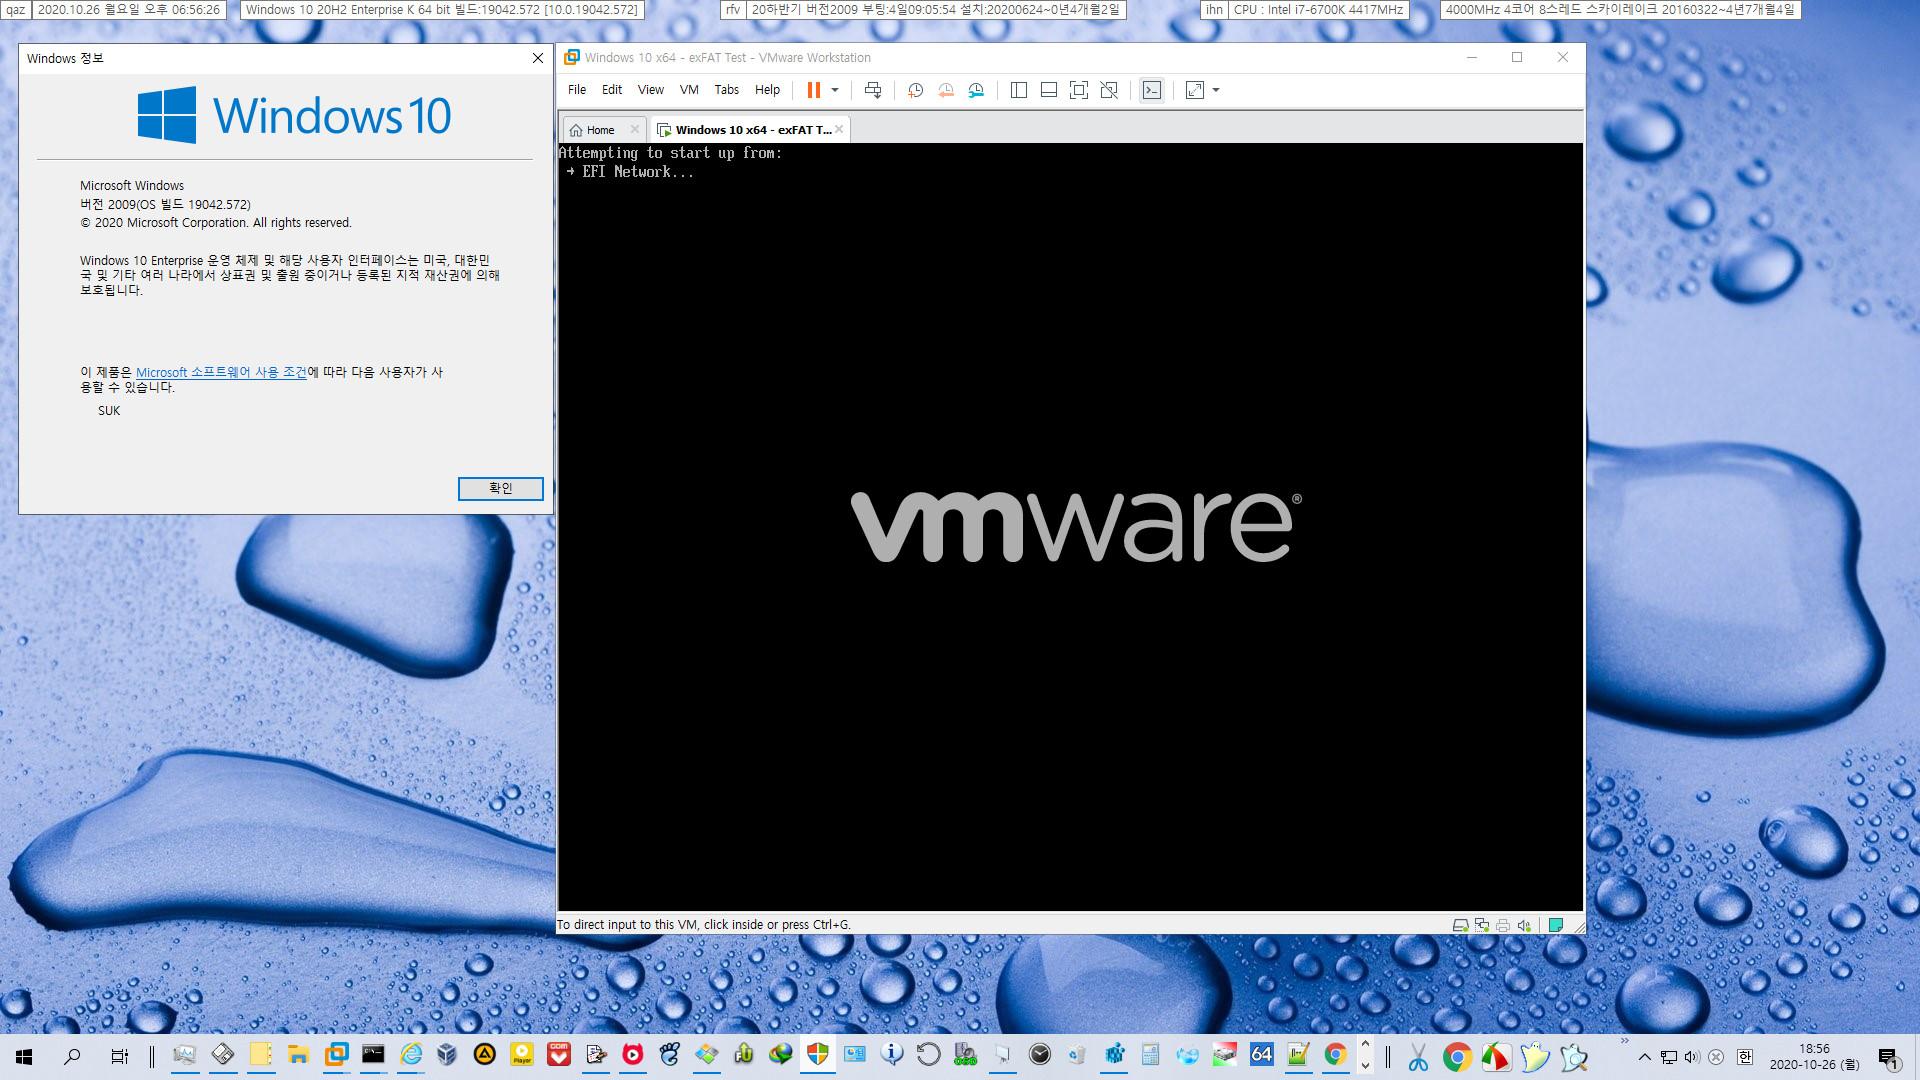 exFAT 포맷으로도 VHD 부팅이 Windows 10 버전 1903부터 된다고 하여 테스트 - 완전 생고생 했습니다 2020-10-26_185626.jpg